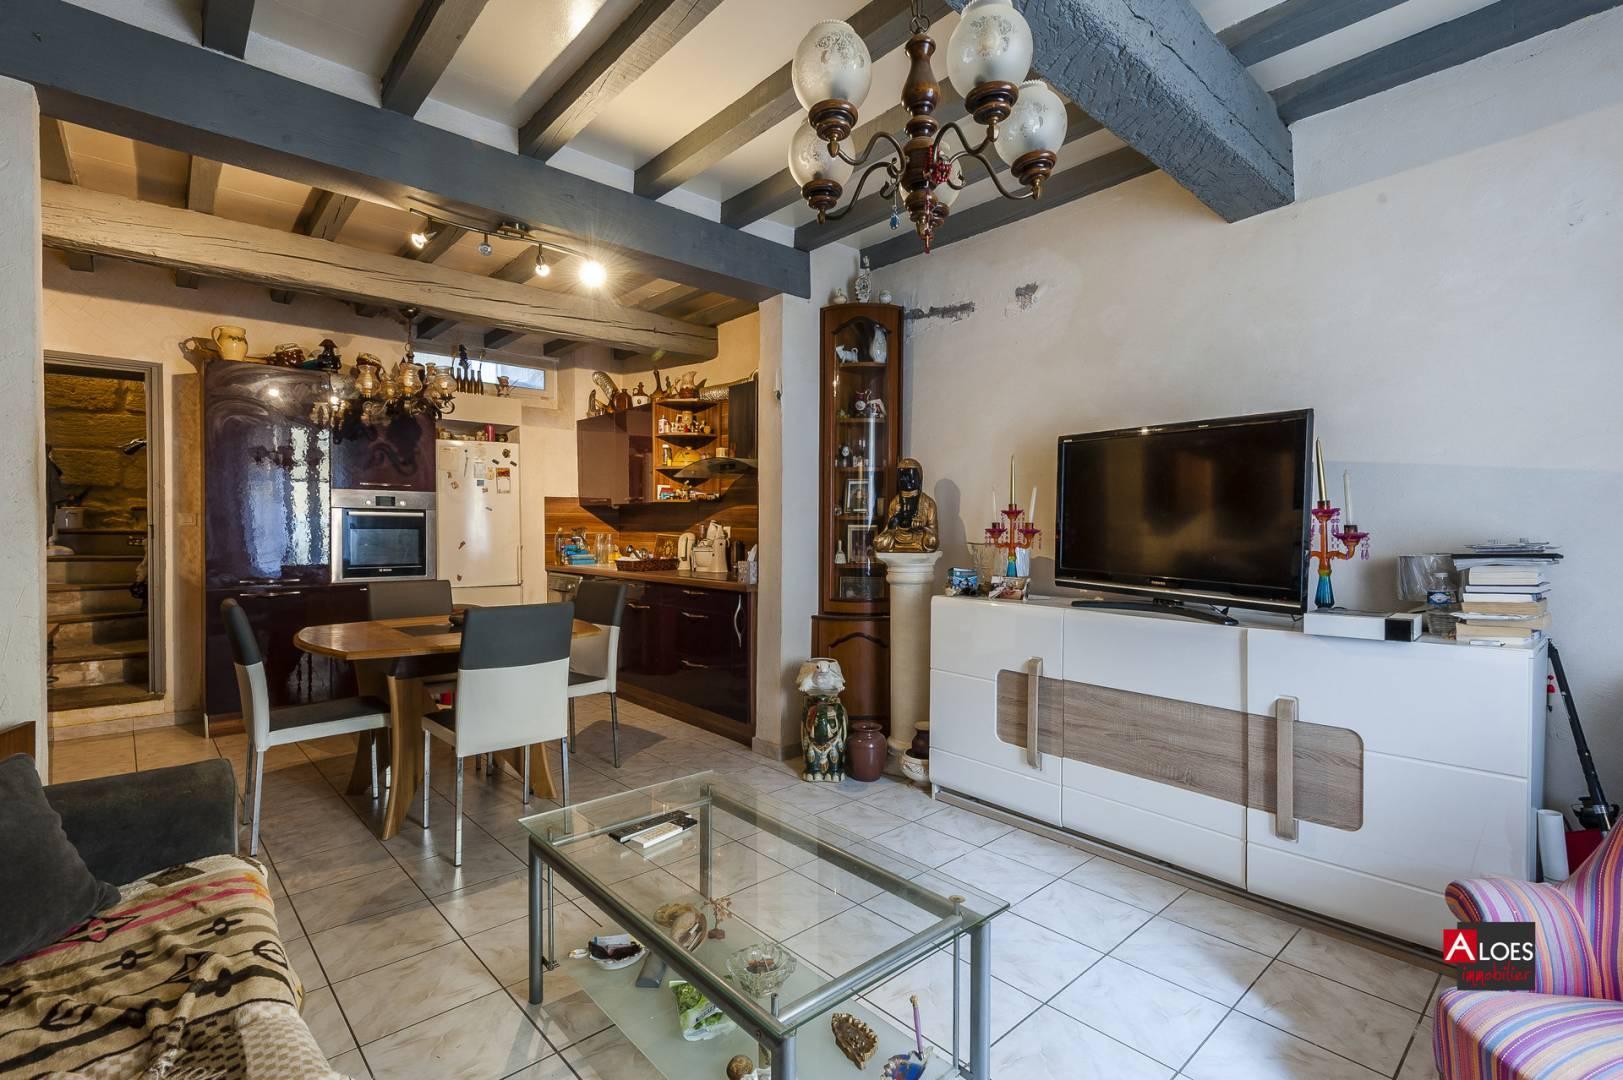 Living-room Tile Chandelier